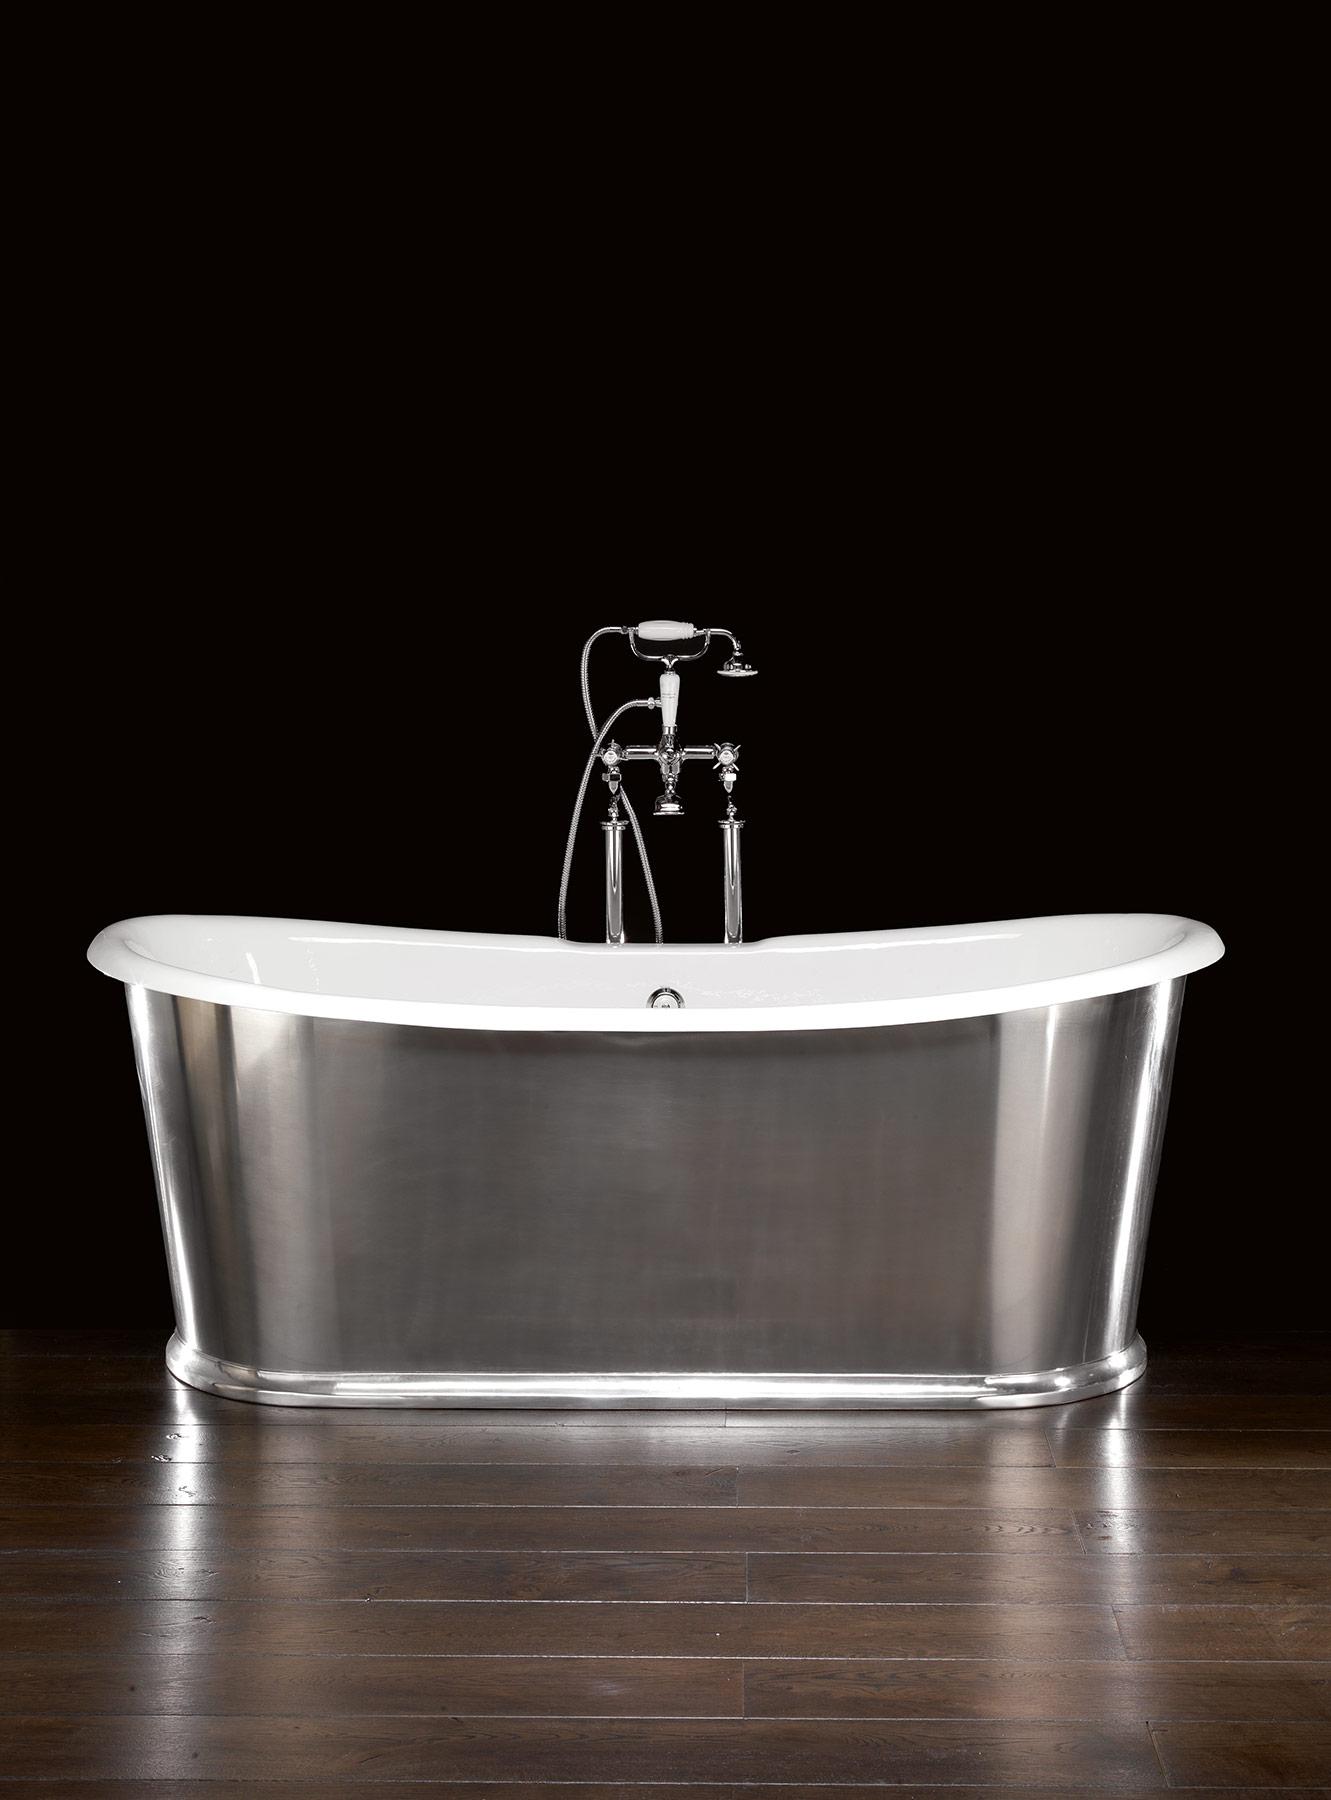 Transitional Regal Freestanding Bathtub